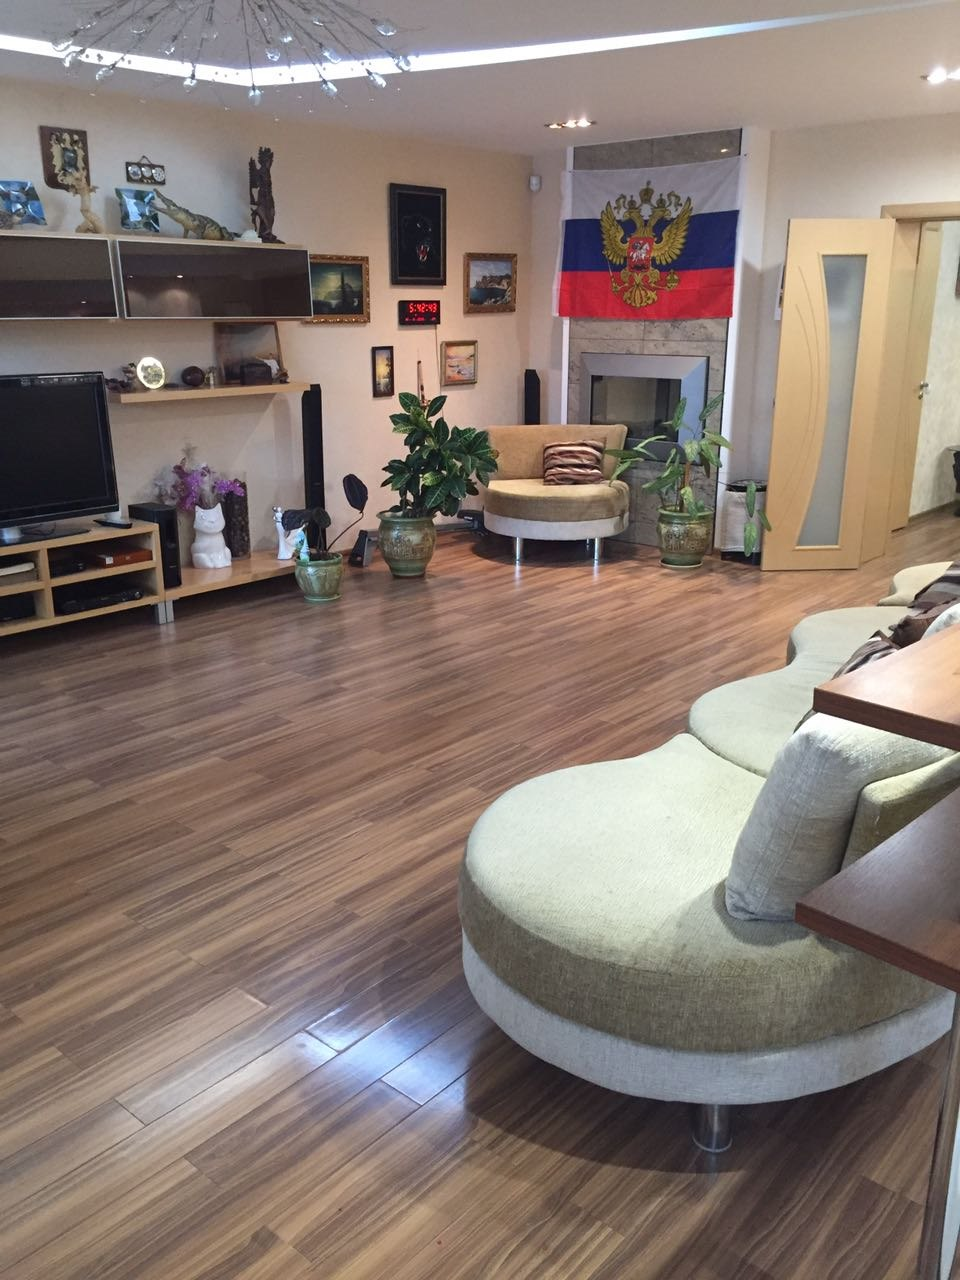 Продажа квартир: 2-комнатная квартира, Благовещенск, Красноармейская ул., 125, фото 1